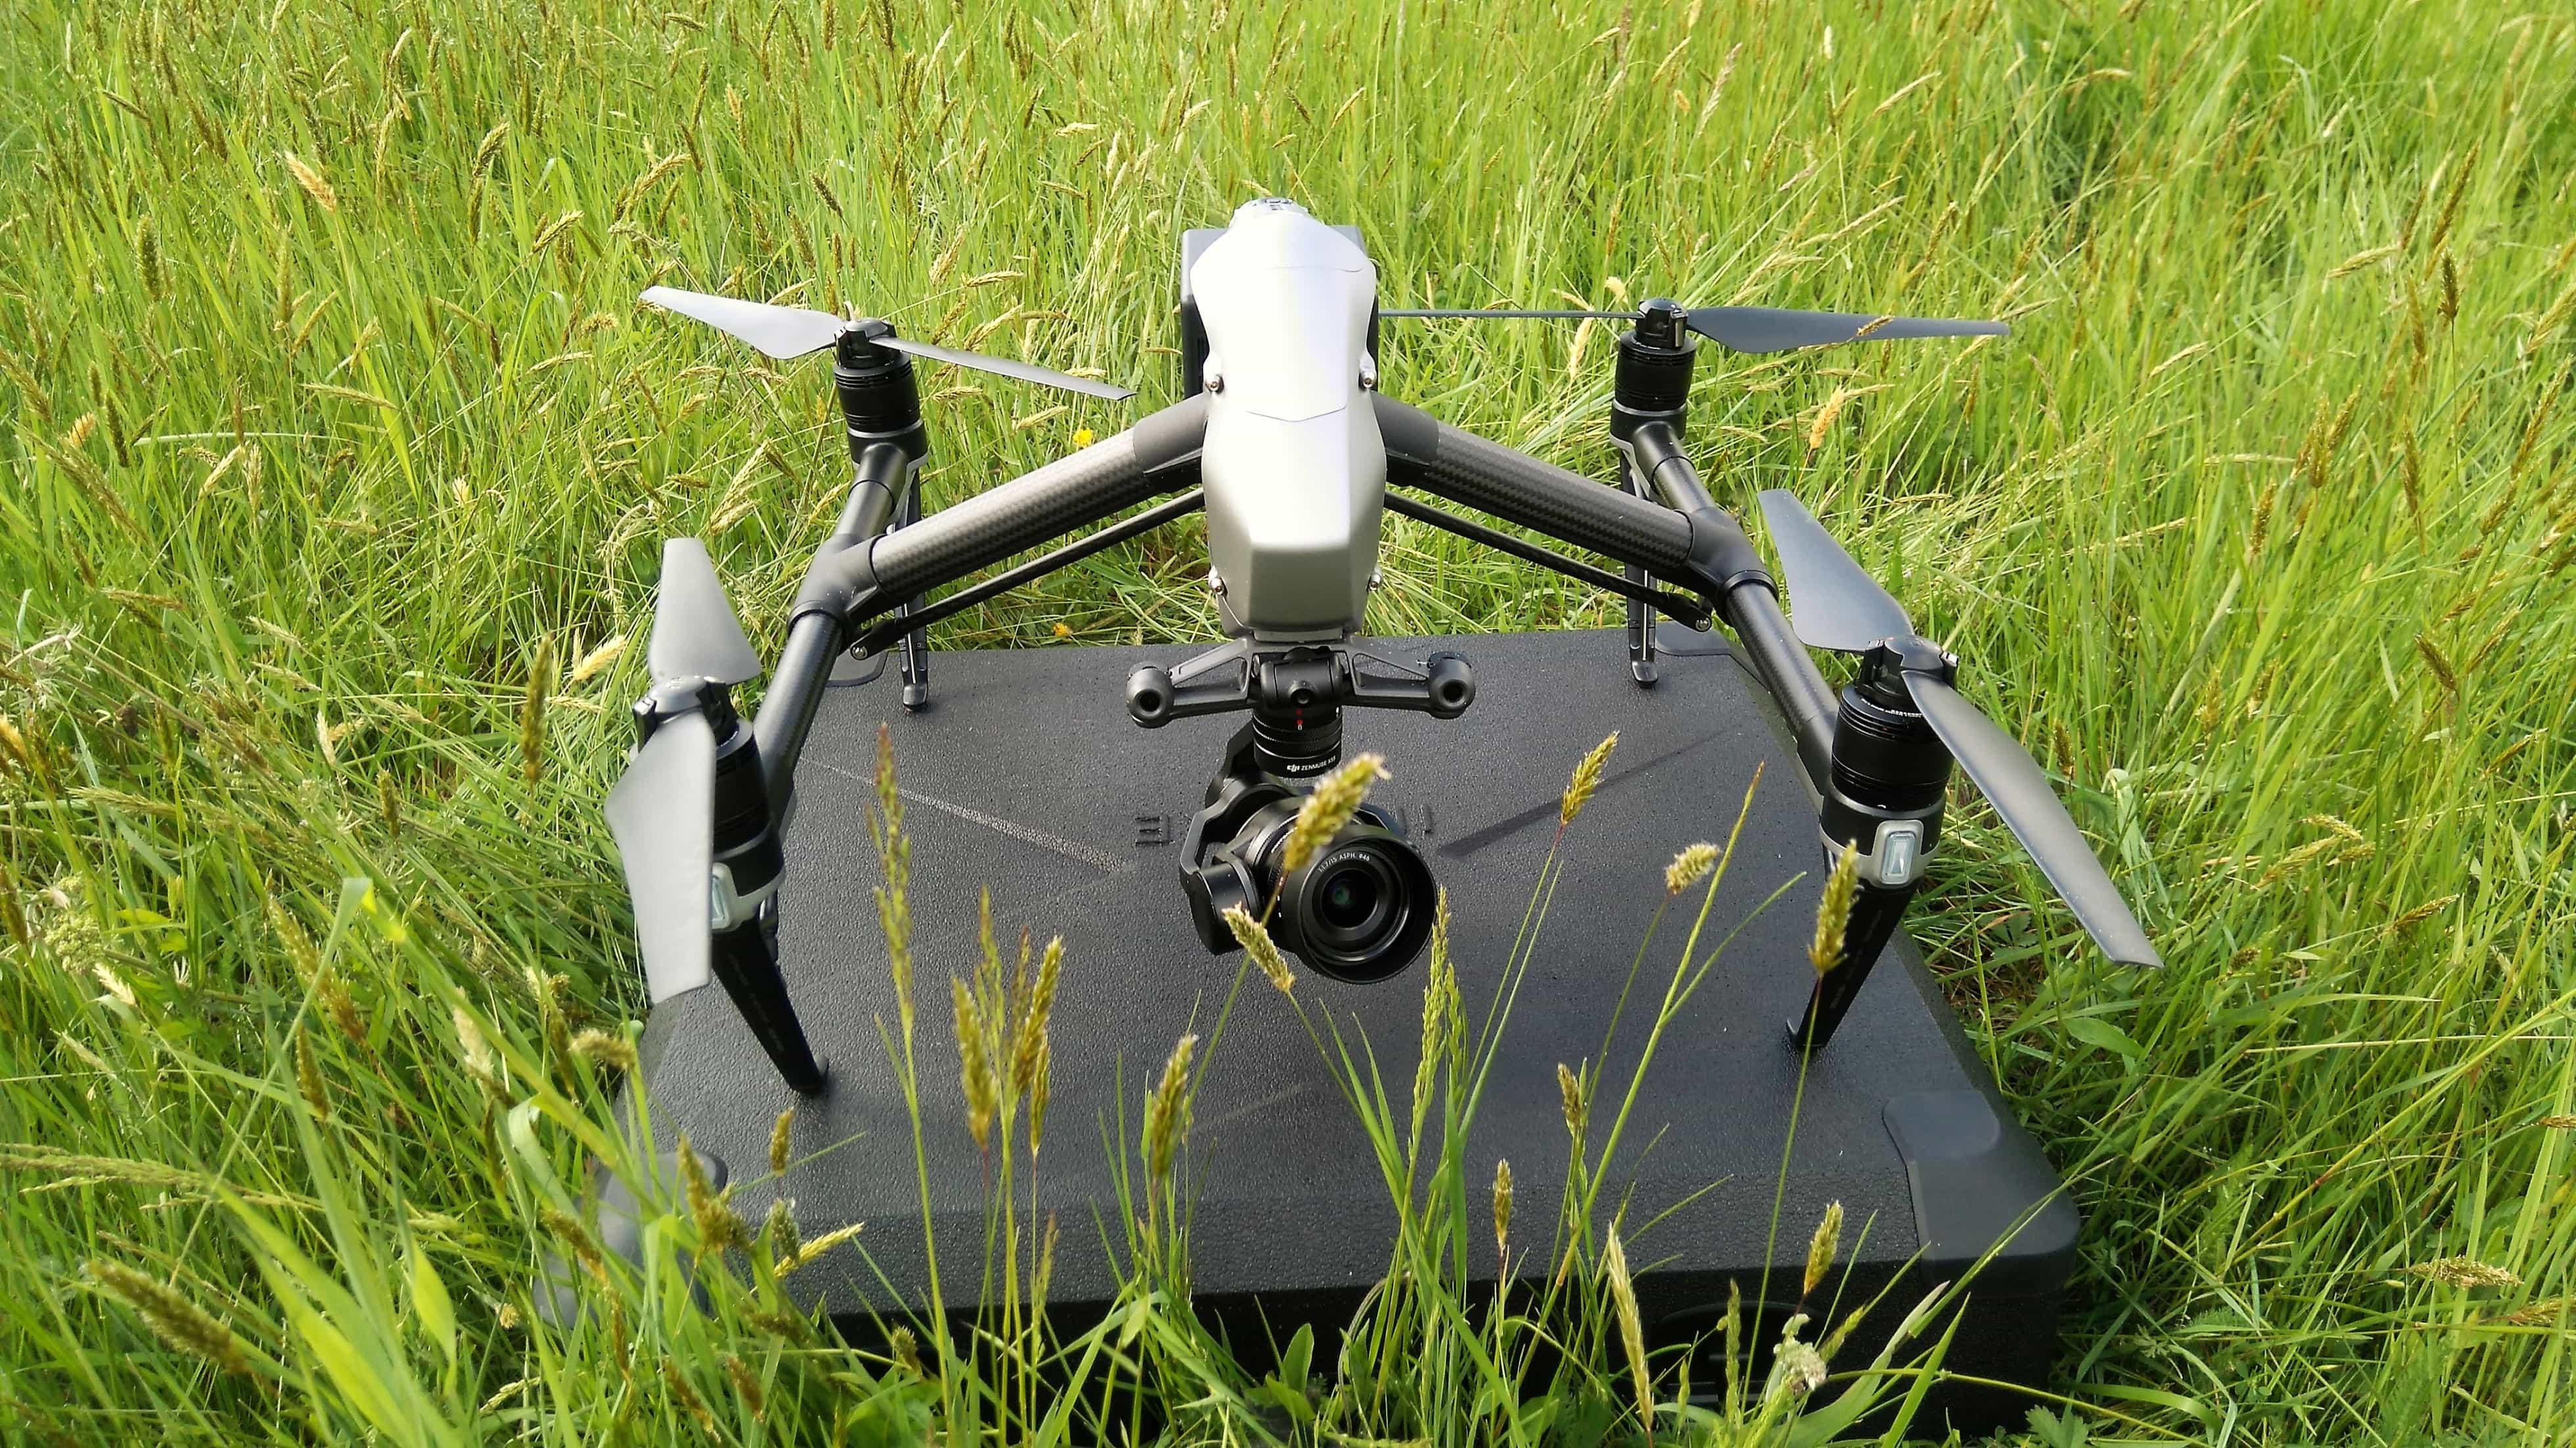 inspire 2 drone dji